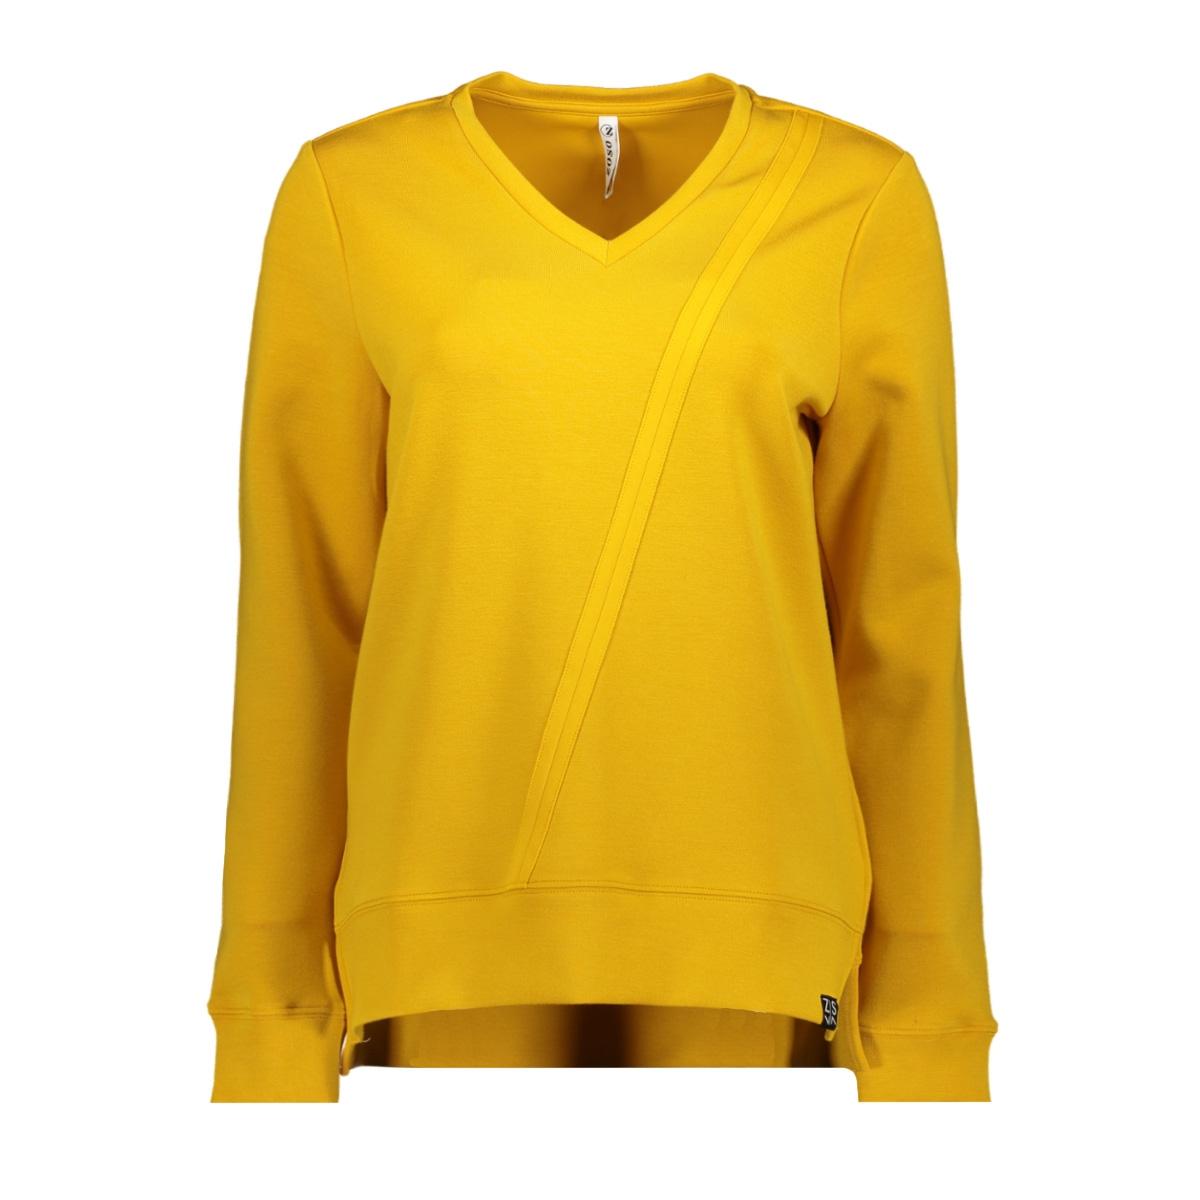 195 happy luxury fabric sweater zoso sweater gold yellow